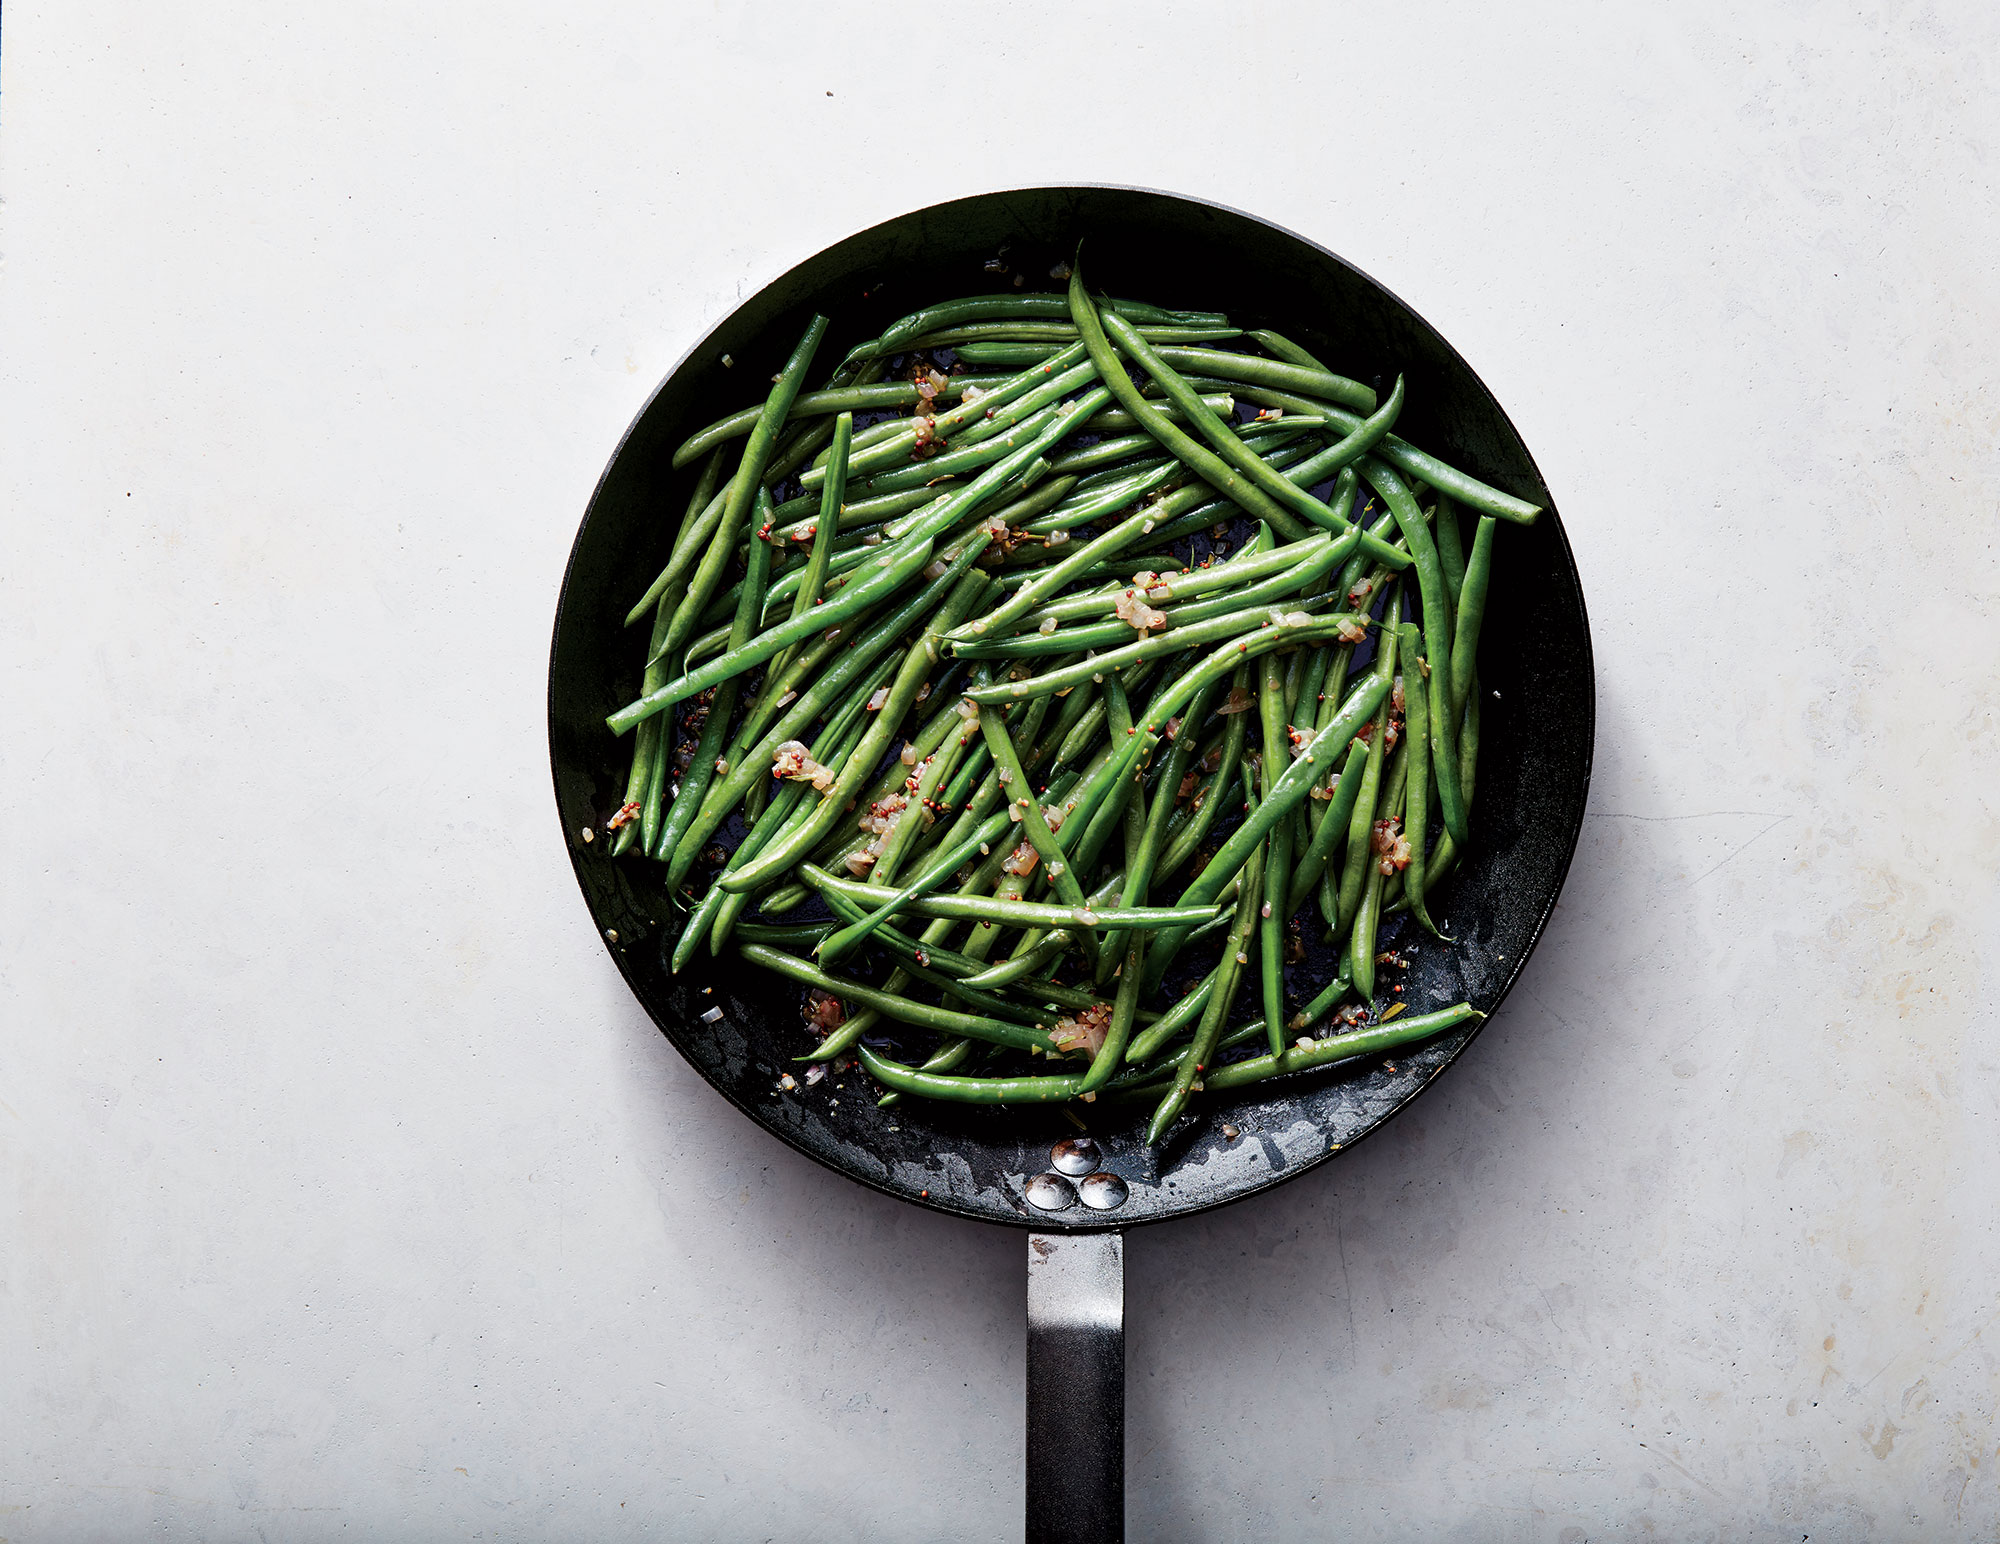 ck- Haricots Verts with Warm Shallot Vinaigrette